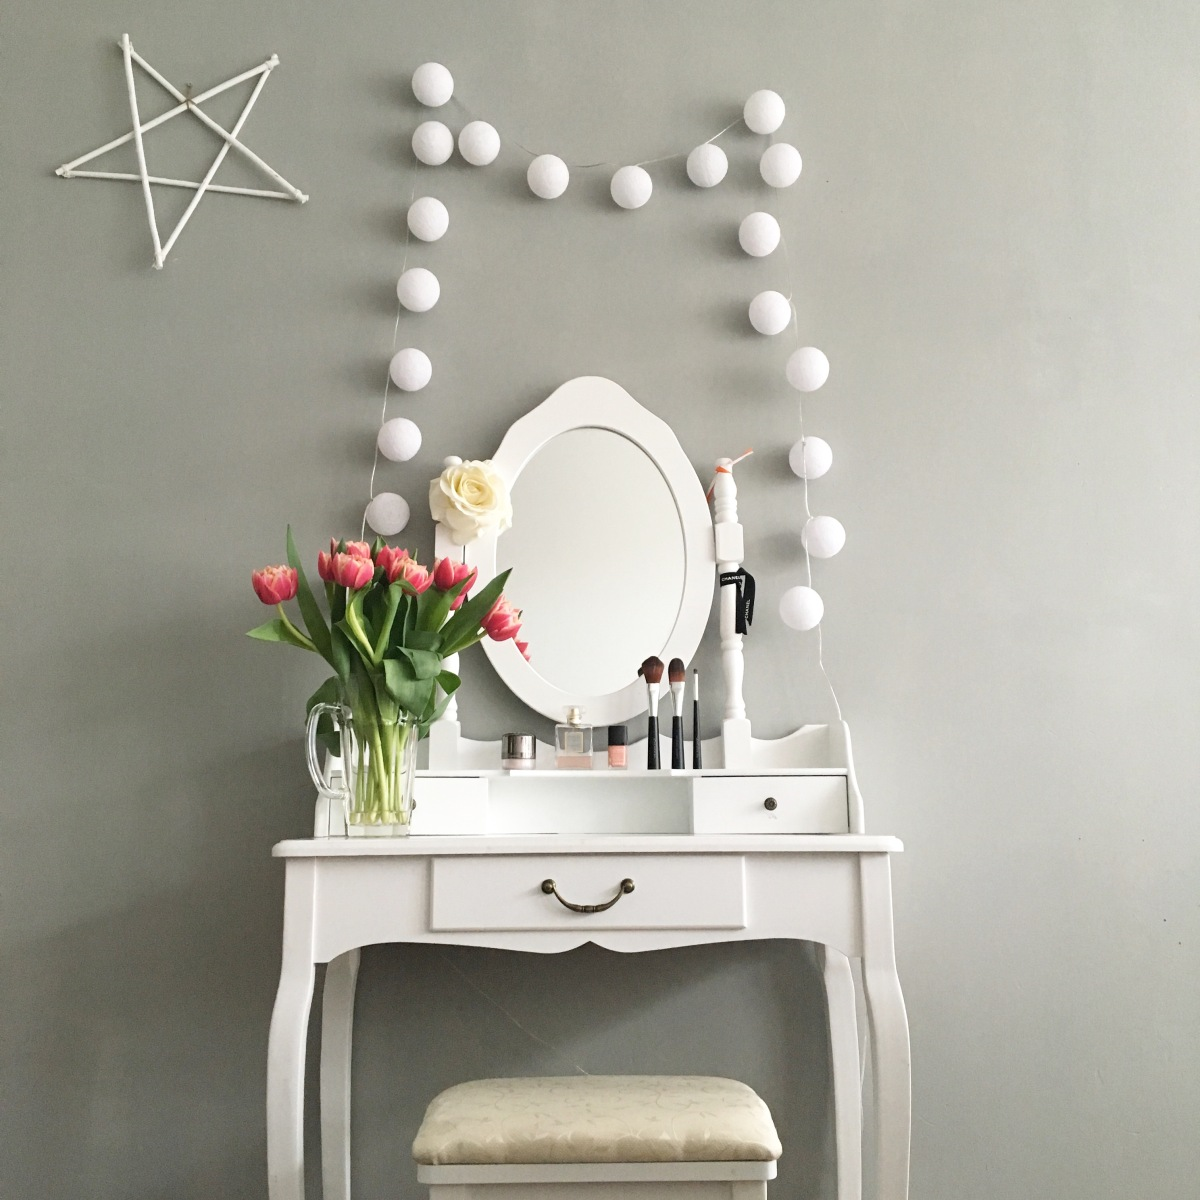 Verrassend Get your make-up dressoir organized | EK-82